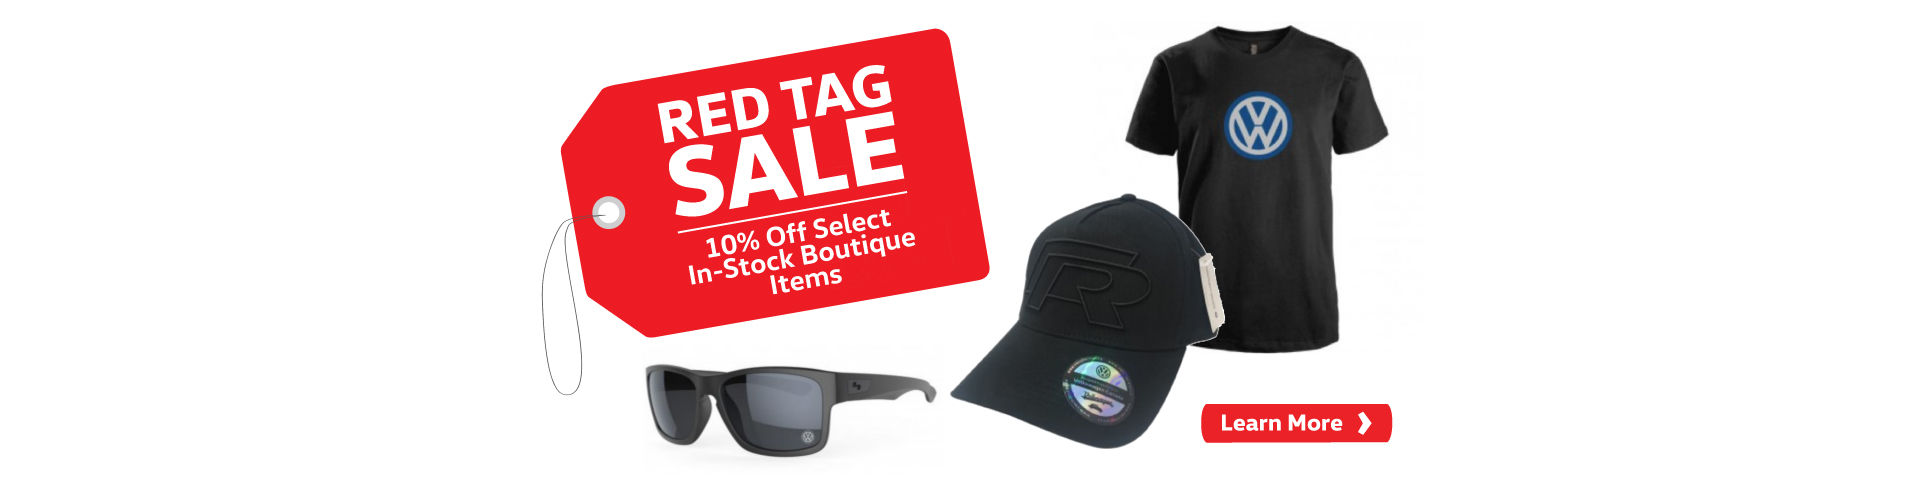 Red Tag Sale - Web Slider